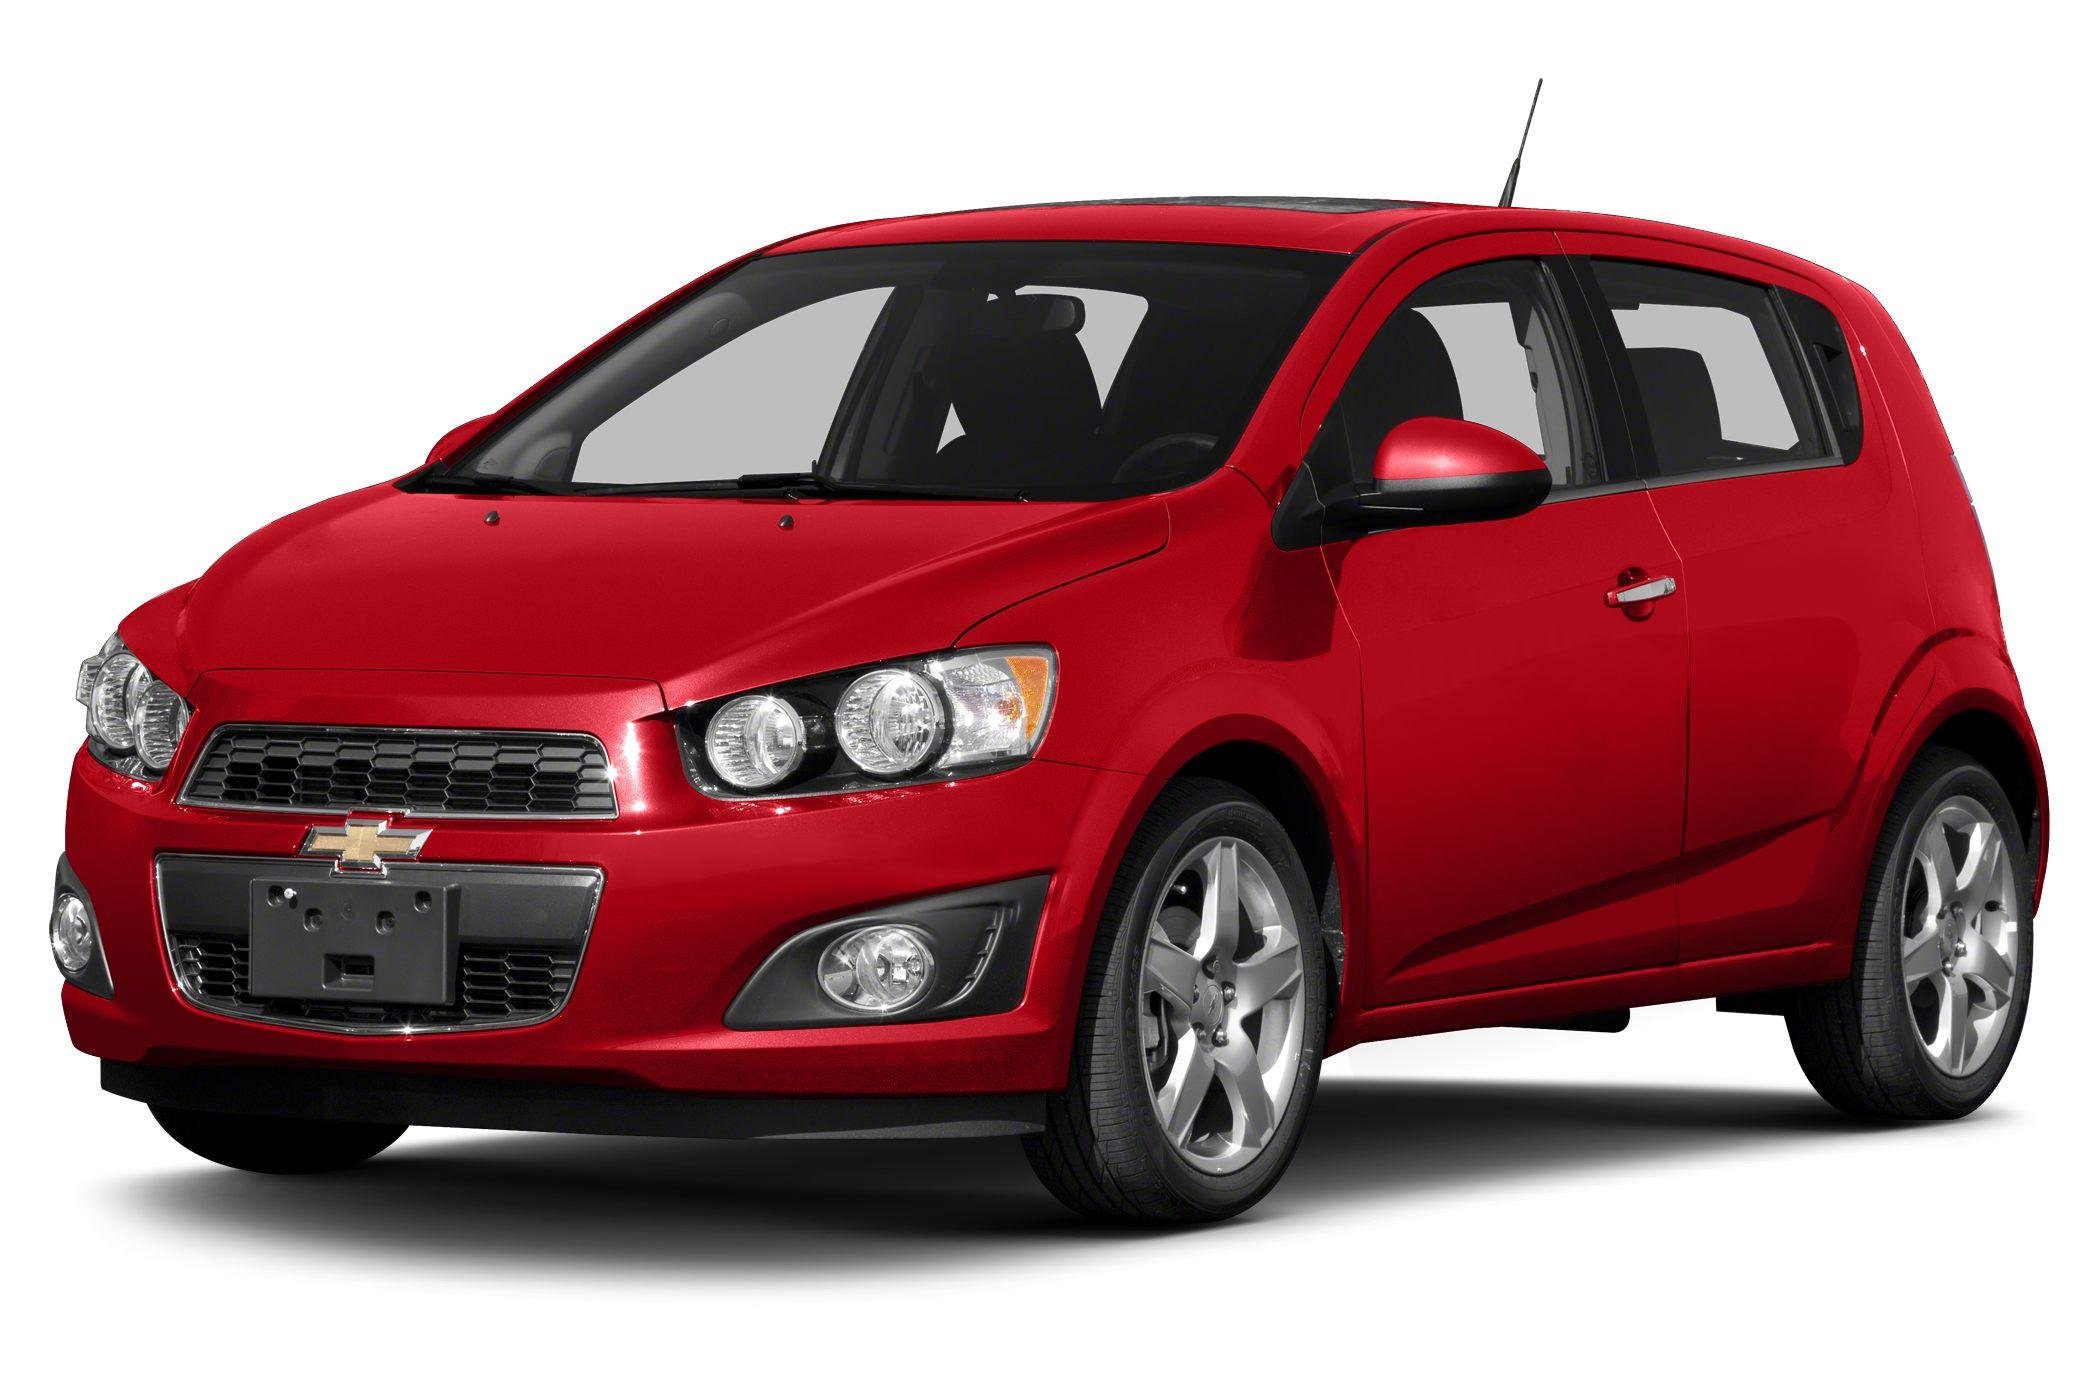 2015 Chevrolet Sonic